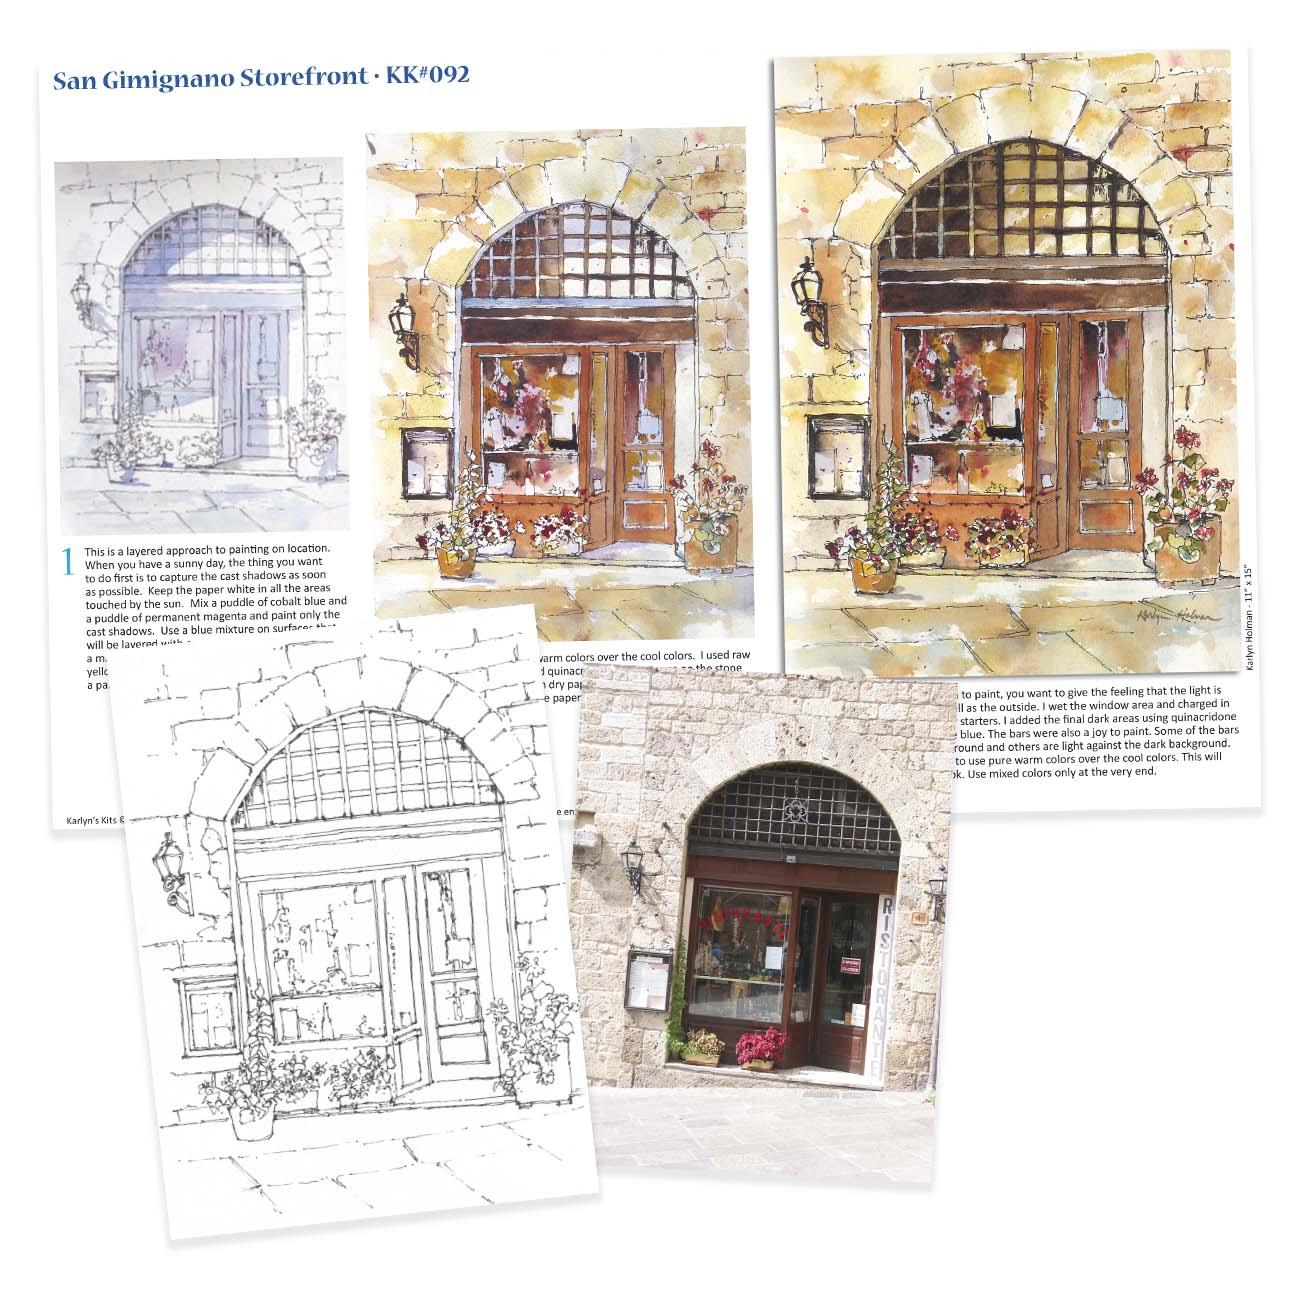 KK092 - San Gimignano Storefront